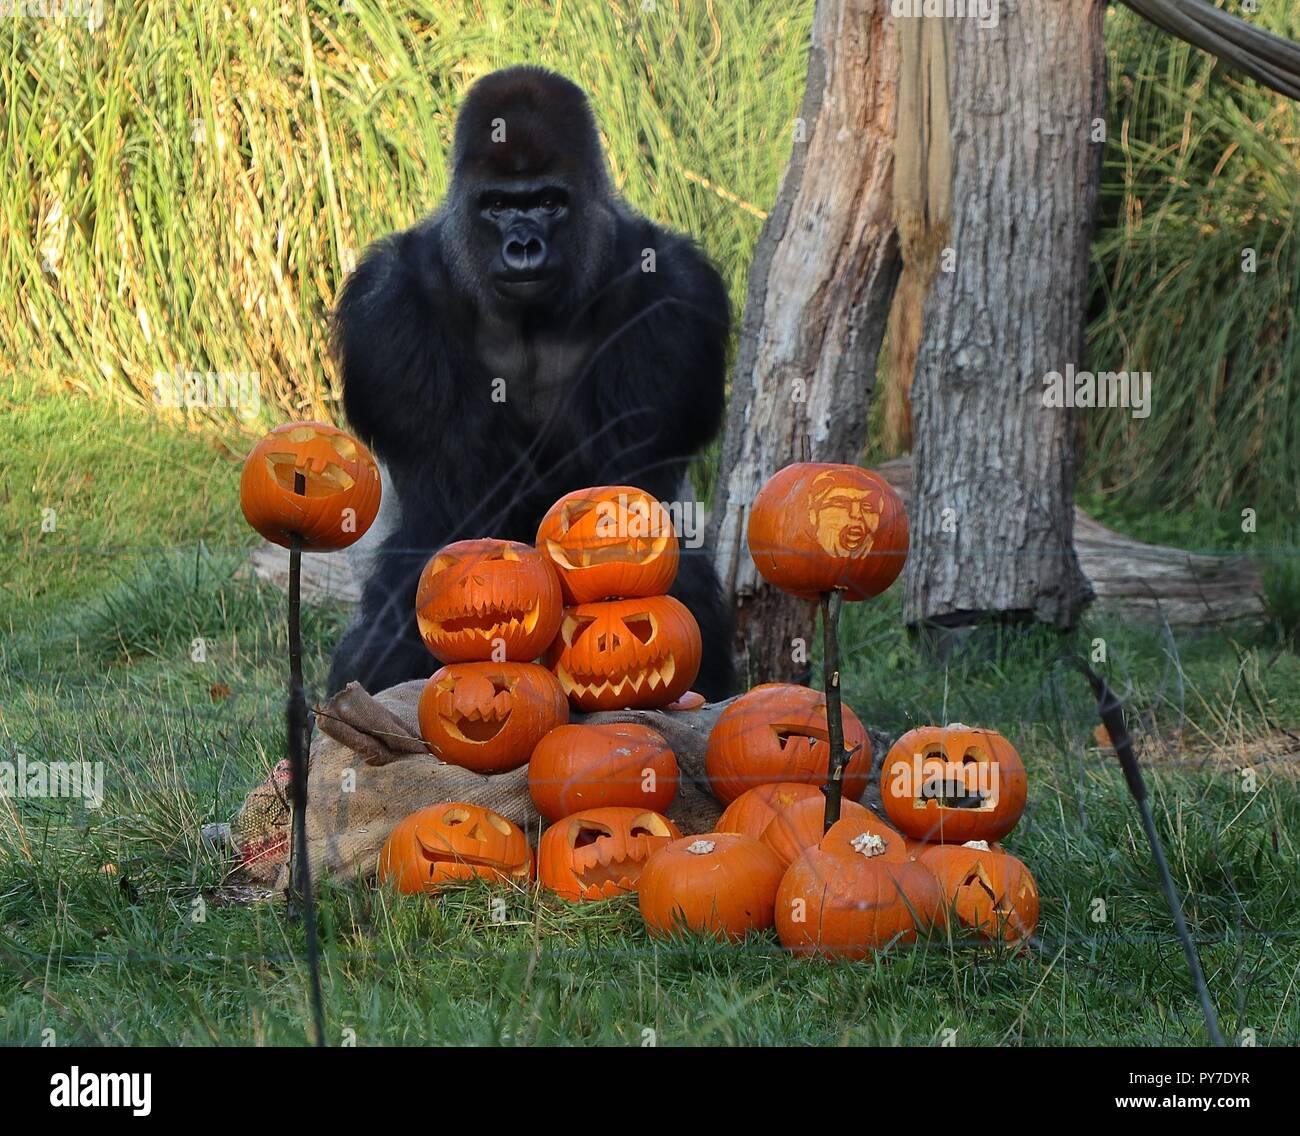 Gorillas at ZSL London Zoo - Stock Image